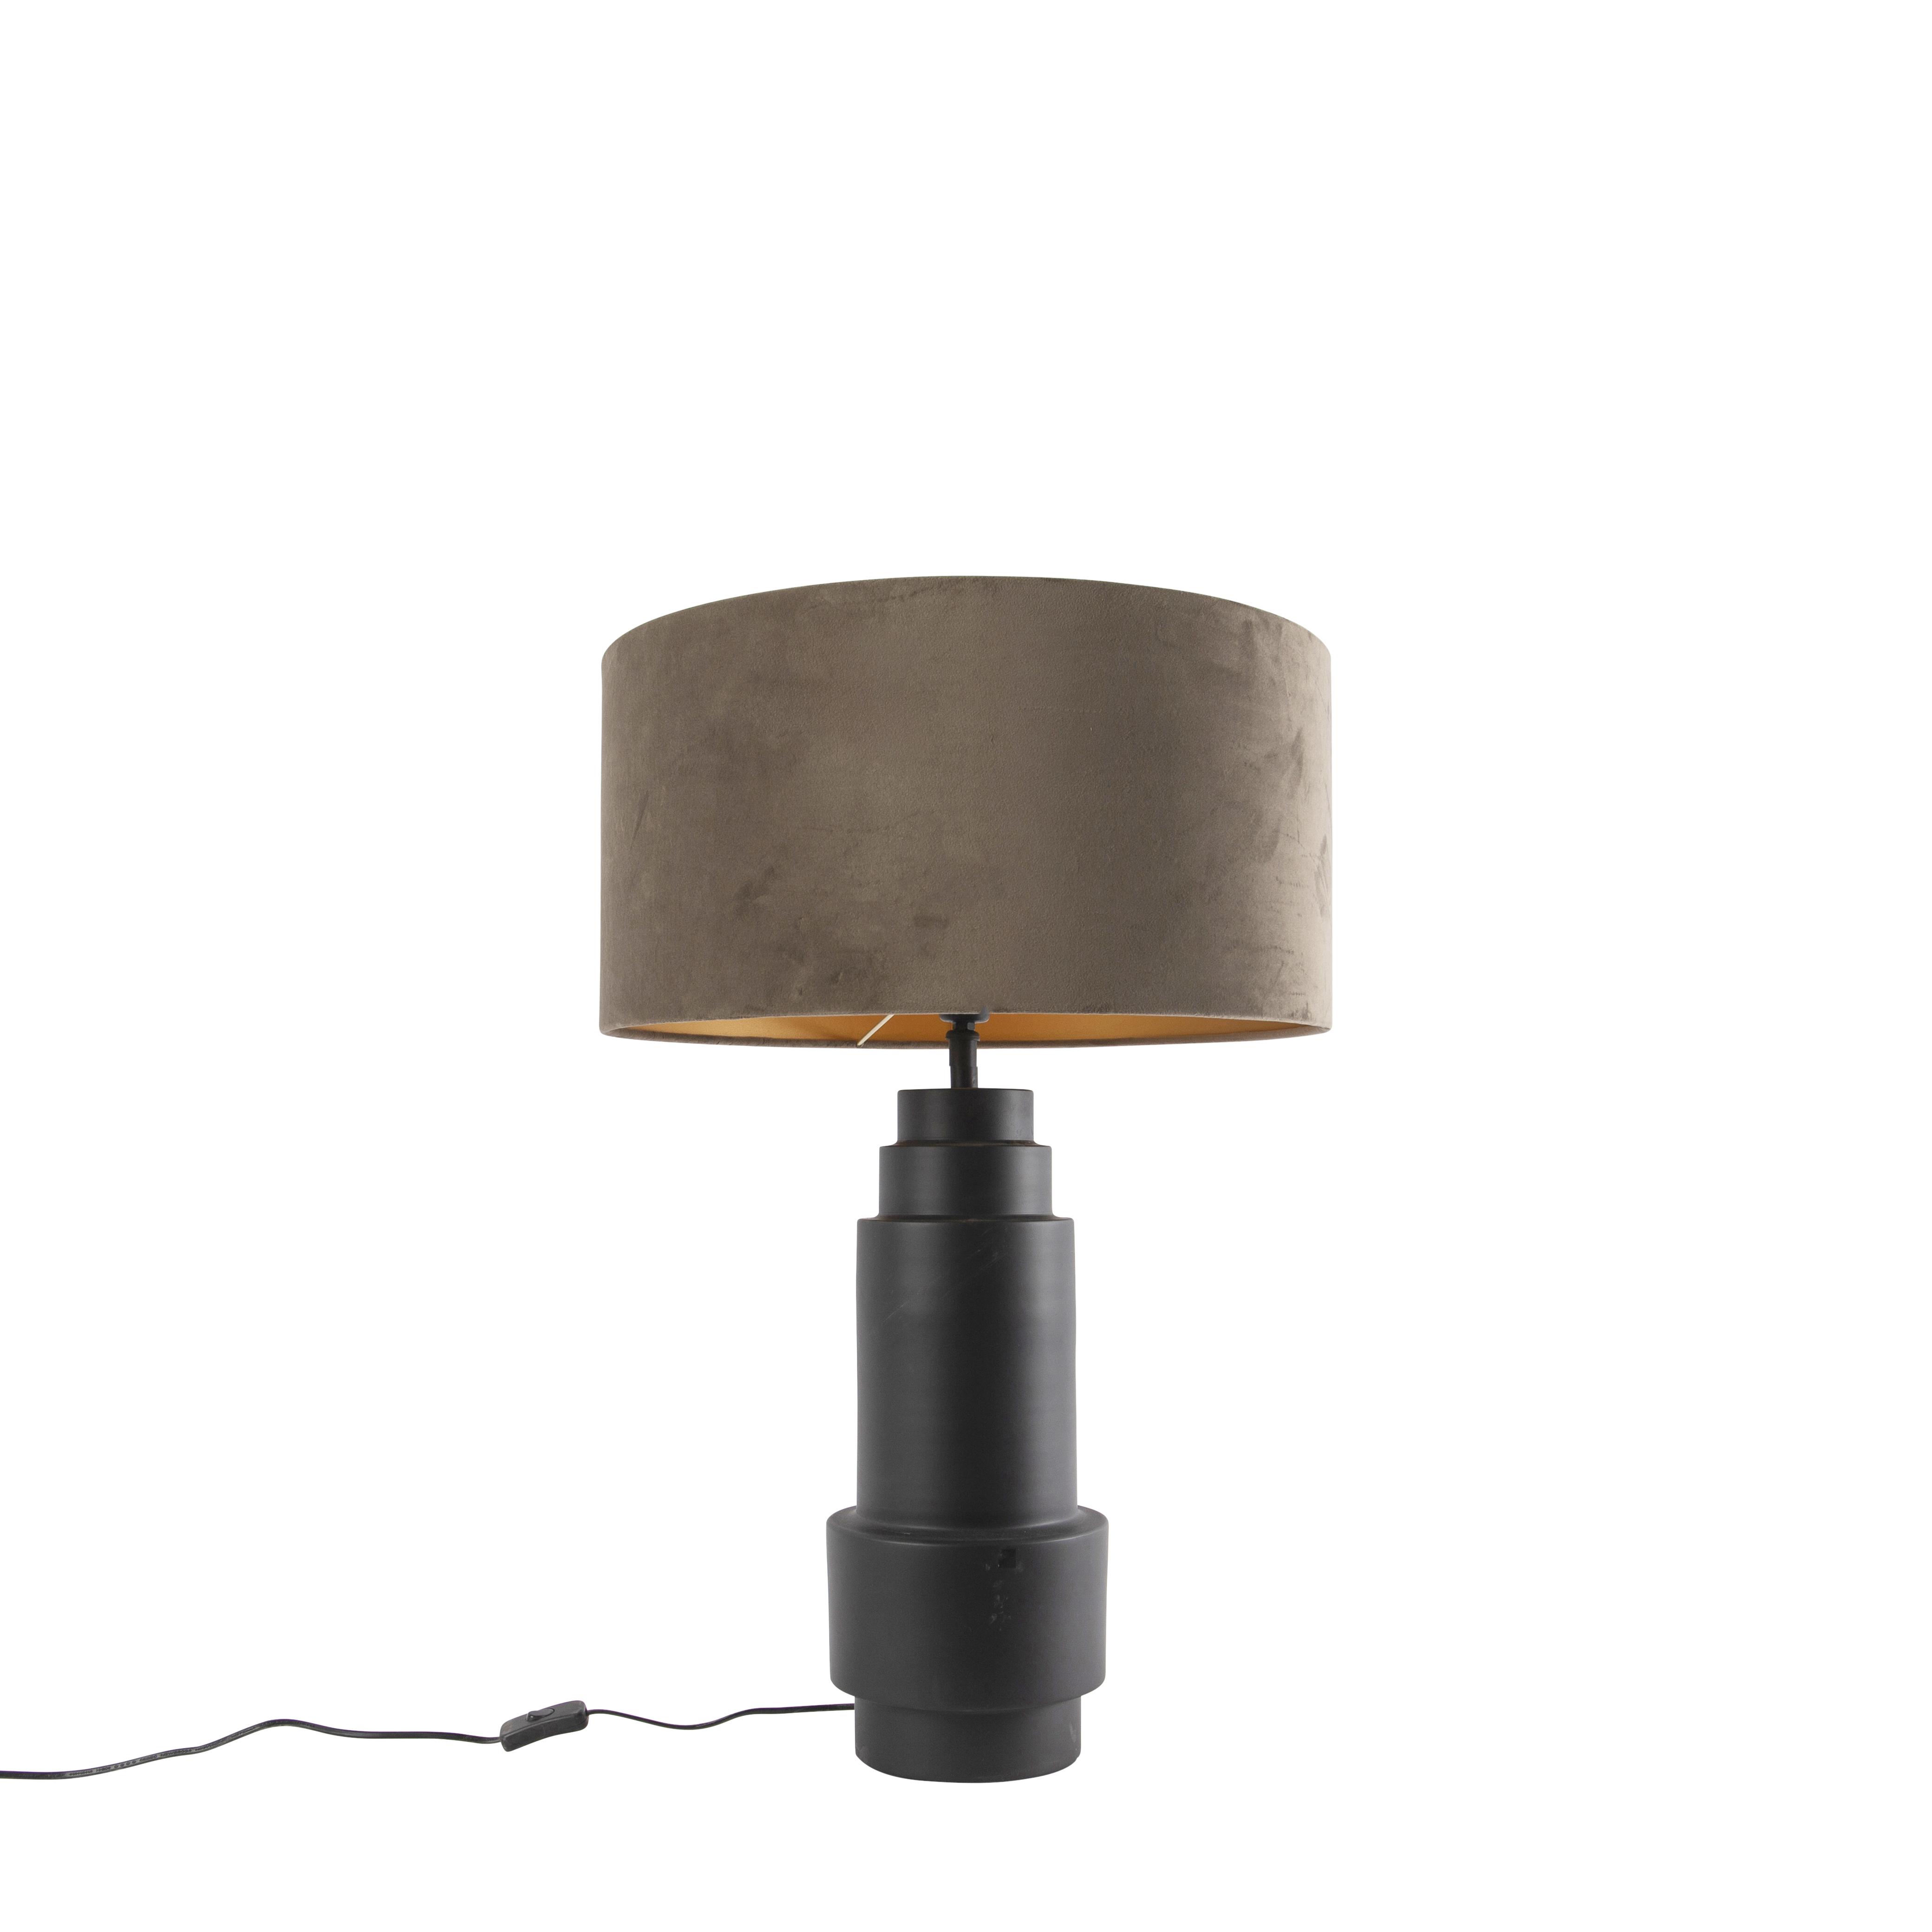 Art deco tafellamp zwart met velours taupe kap 50 cm - Bruut